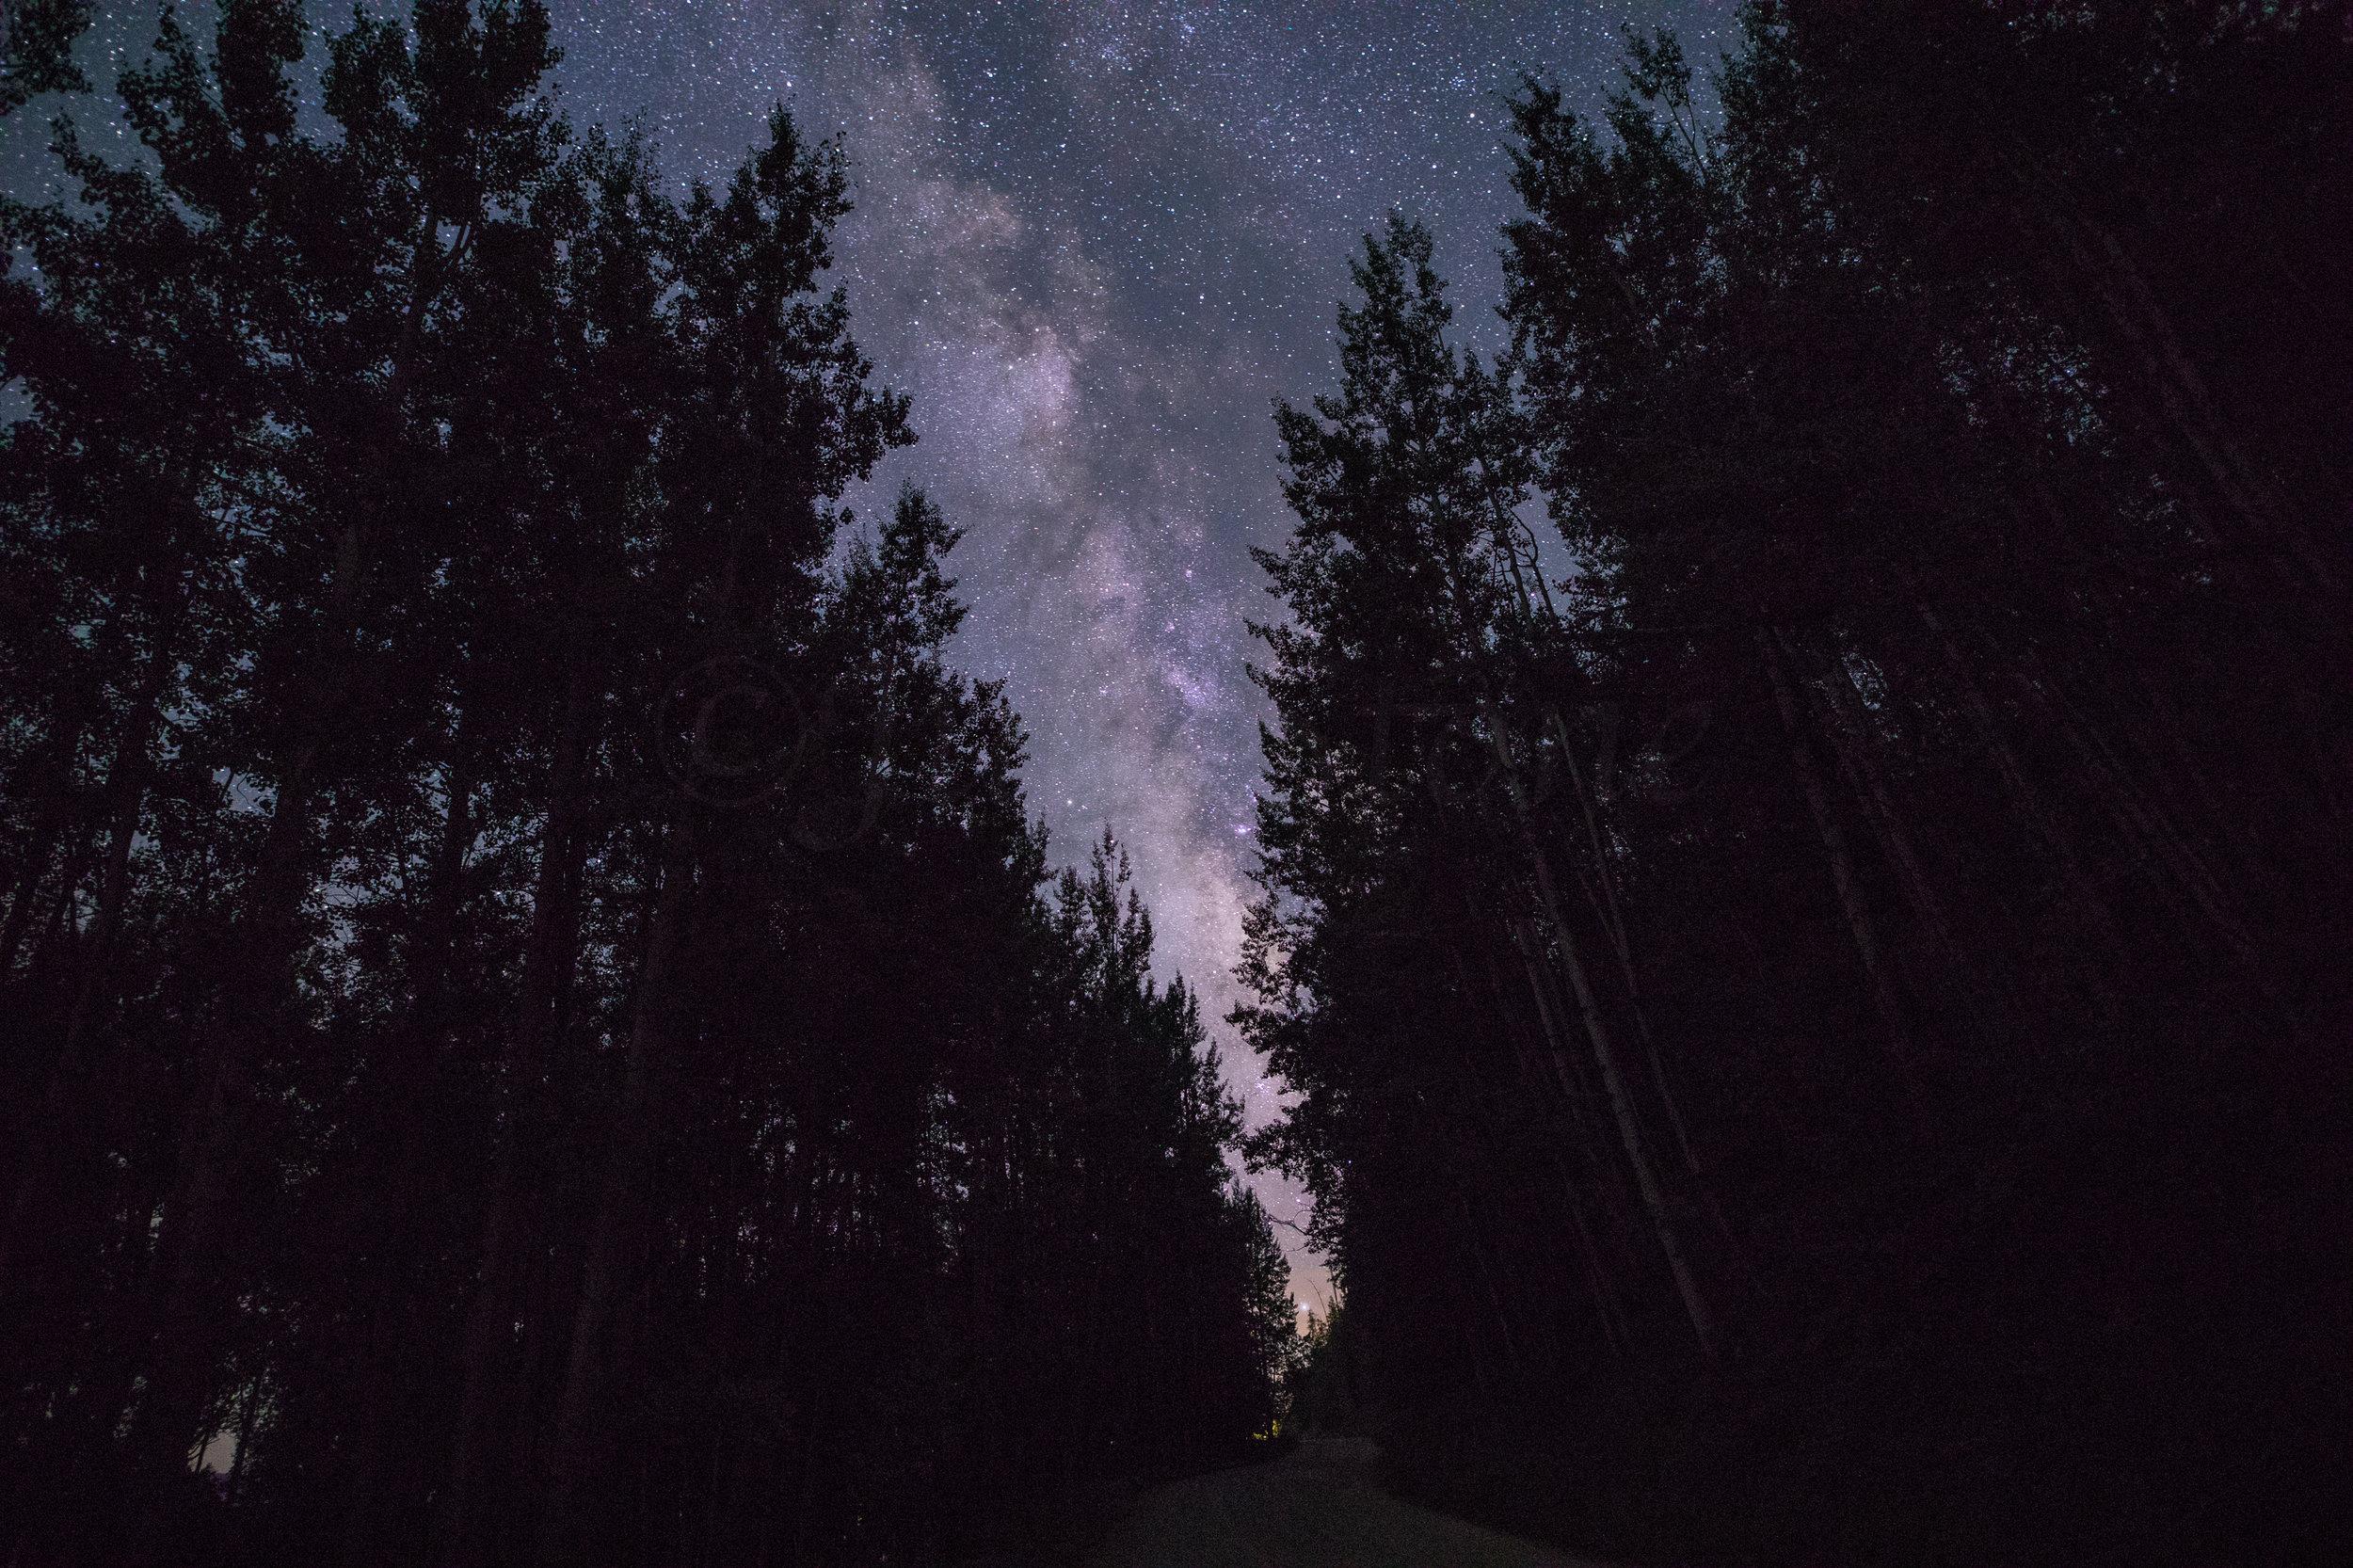 Purgatory Milky Way, Image # 7611